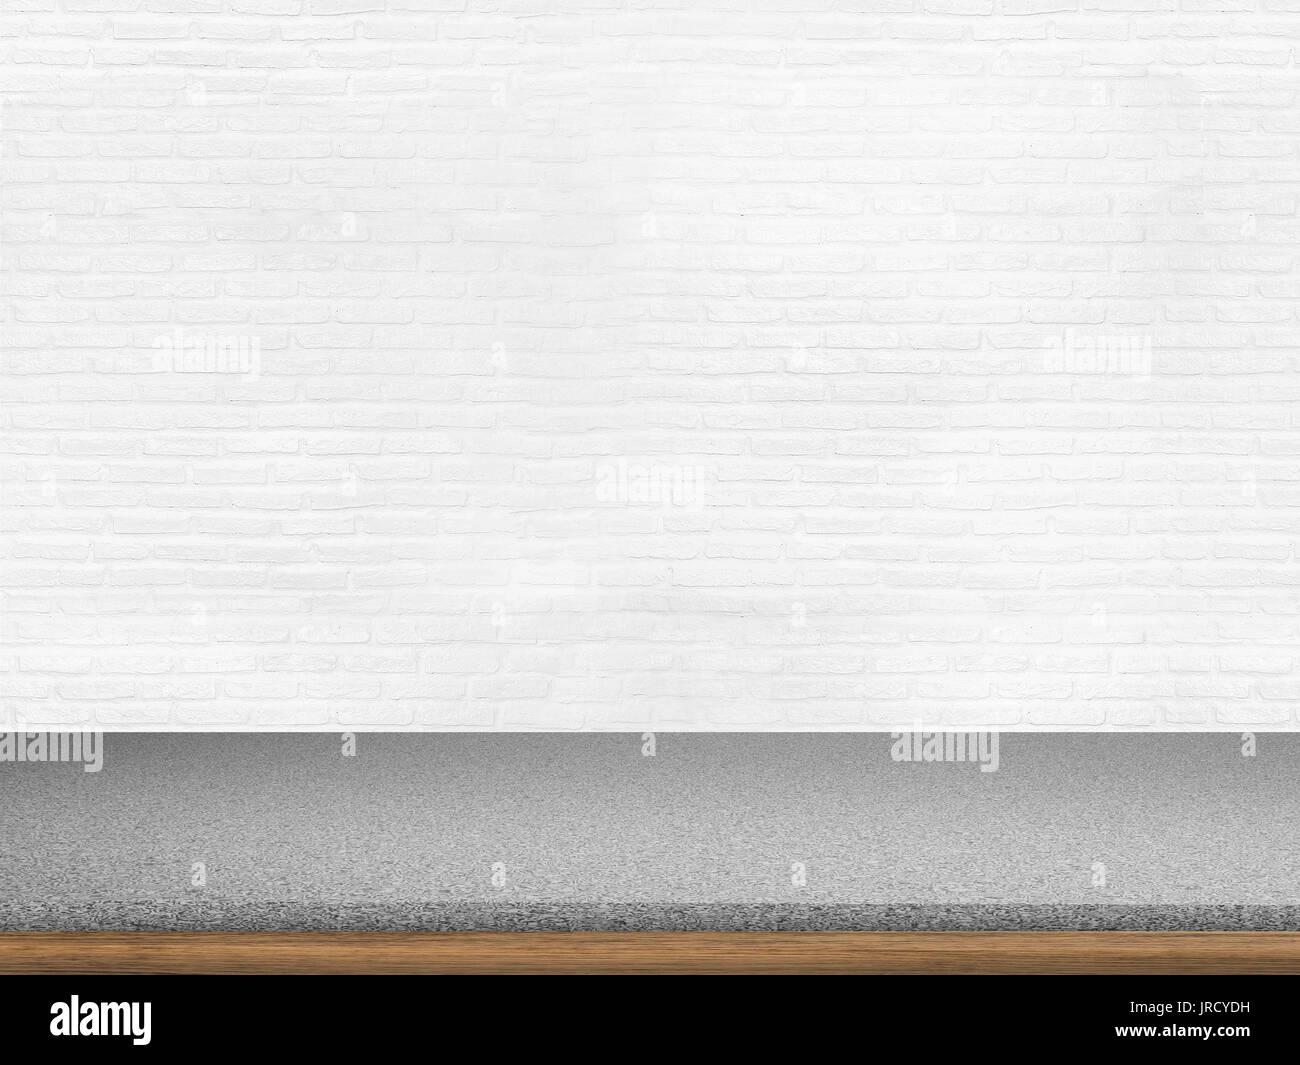 countertop background.  Countertop Countertop Background Granite Countertop On White Background With O